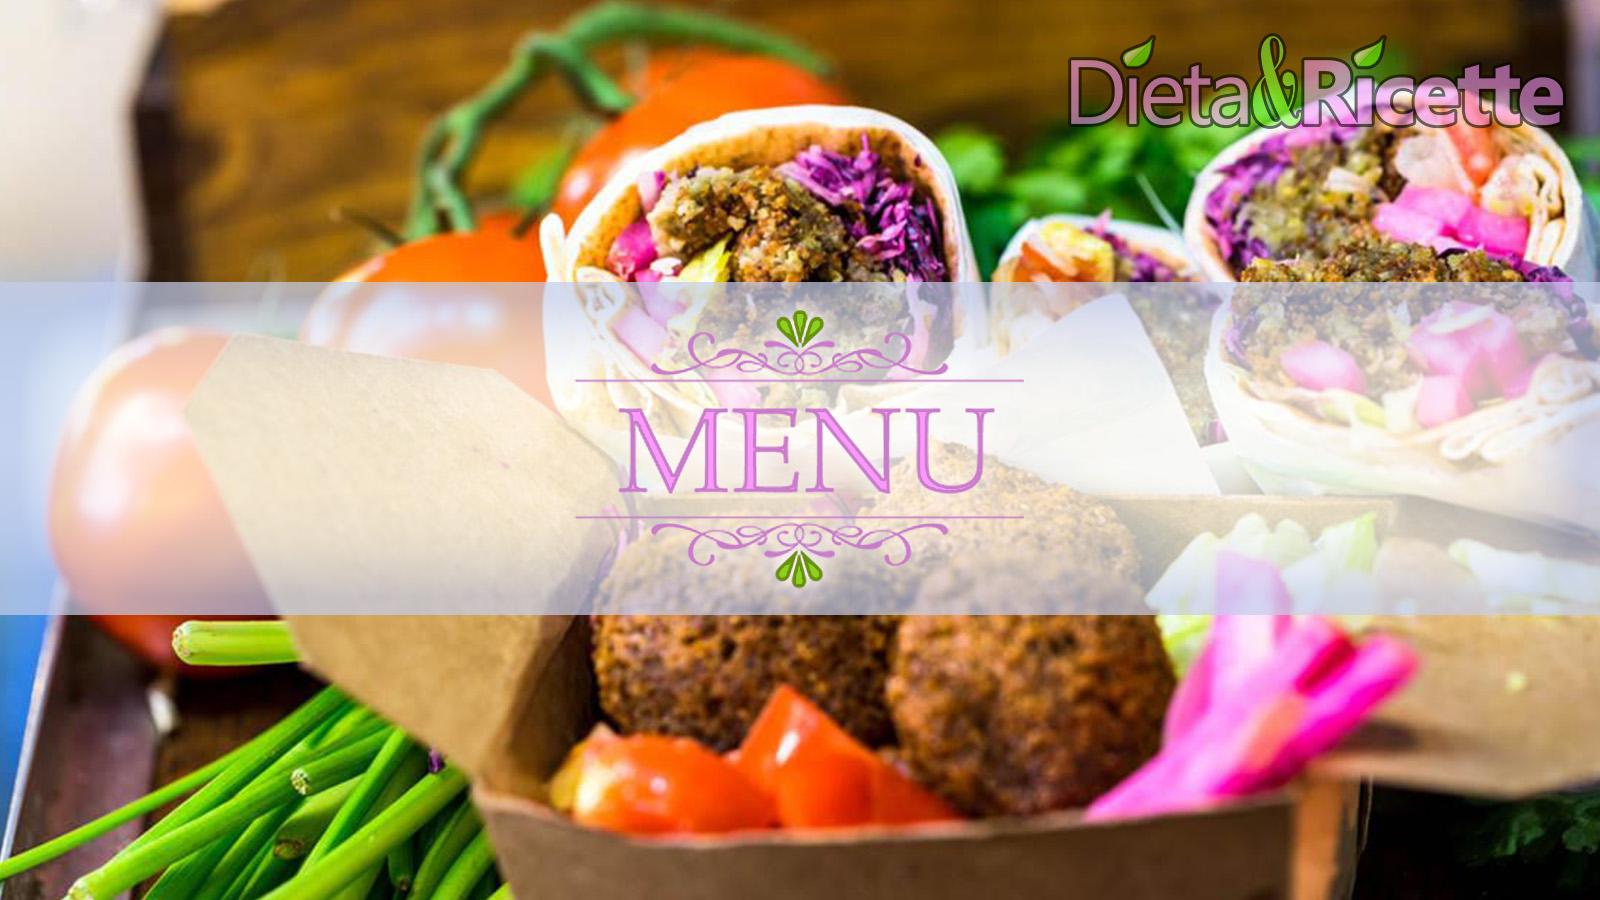 Ricetta Vegetariana Dieta.Dieta Vegetariana Equilibrata Esempio Con Menu Settimanale